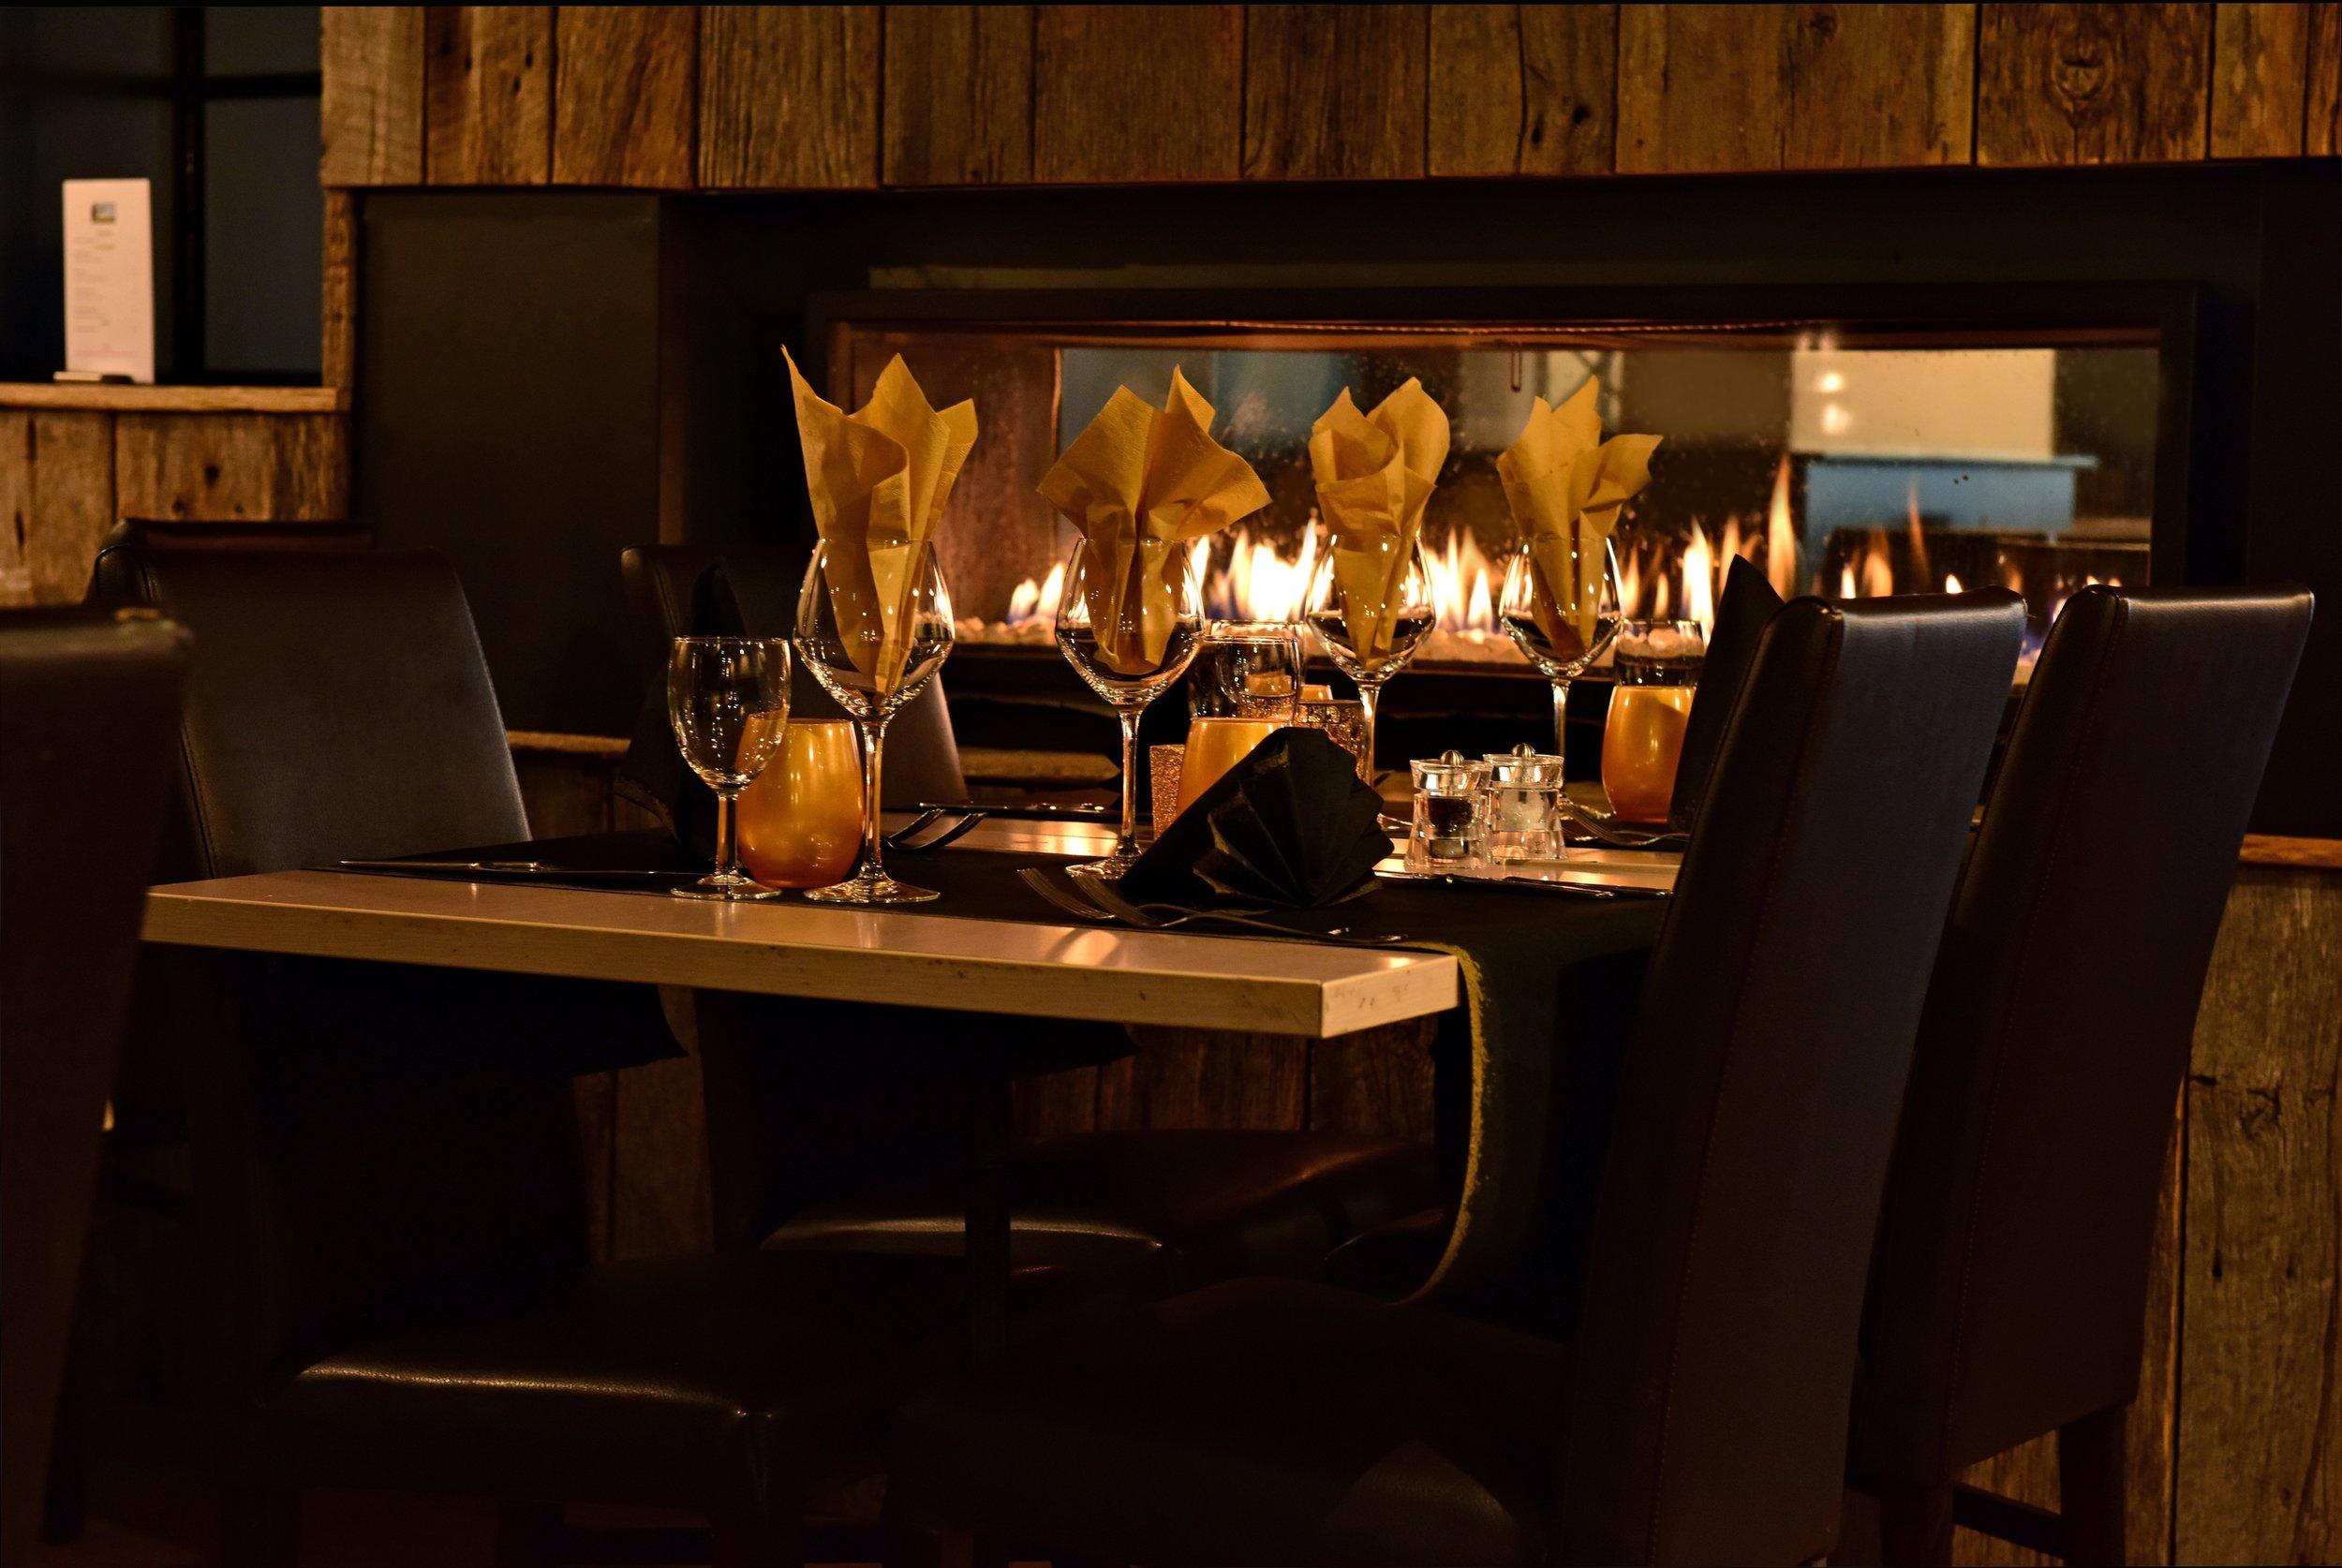 3 restuarant brasserie t filet purreke pureke aalst steak pur tablefever .jpg